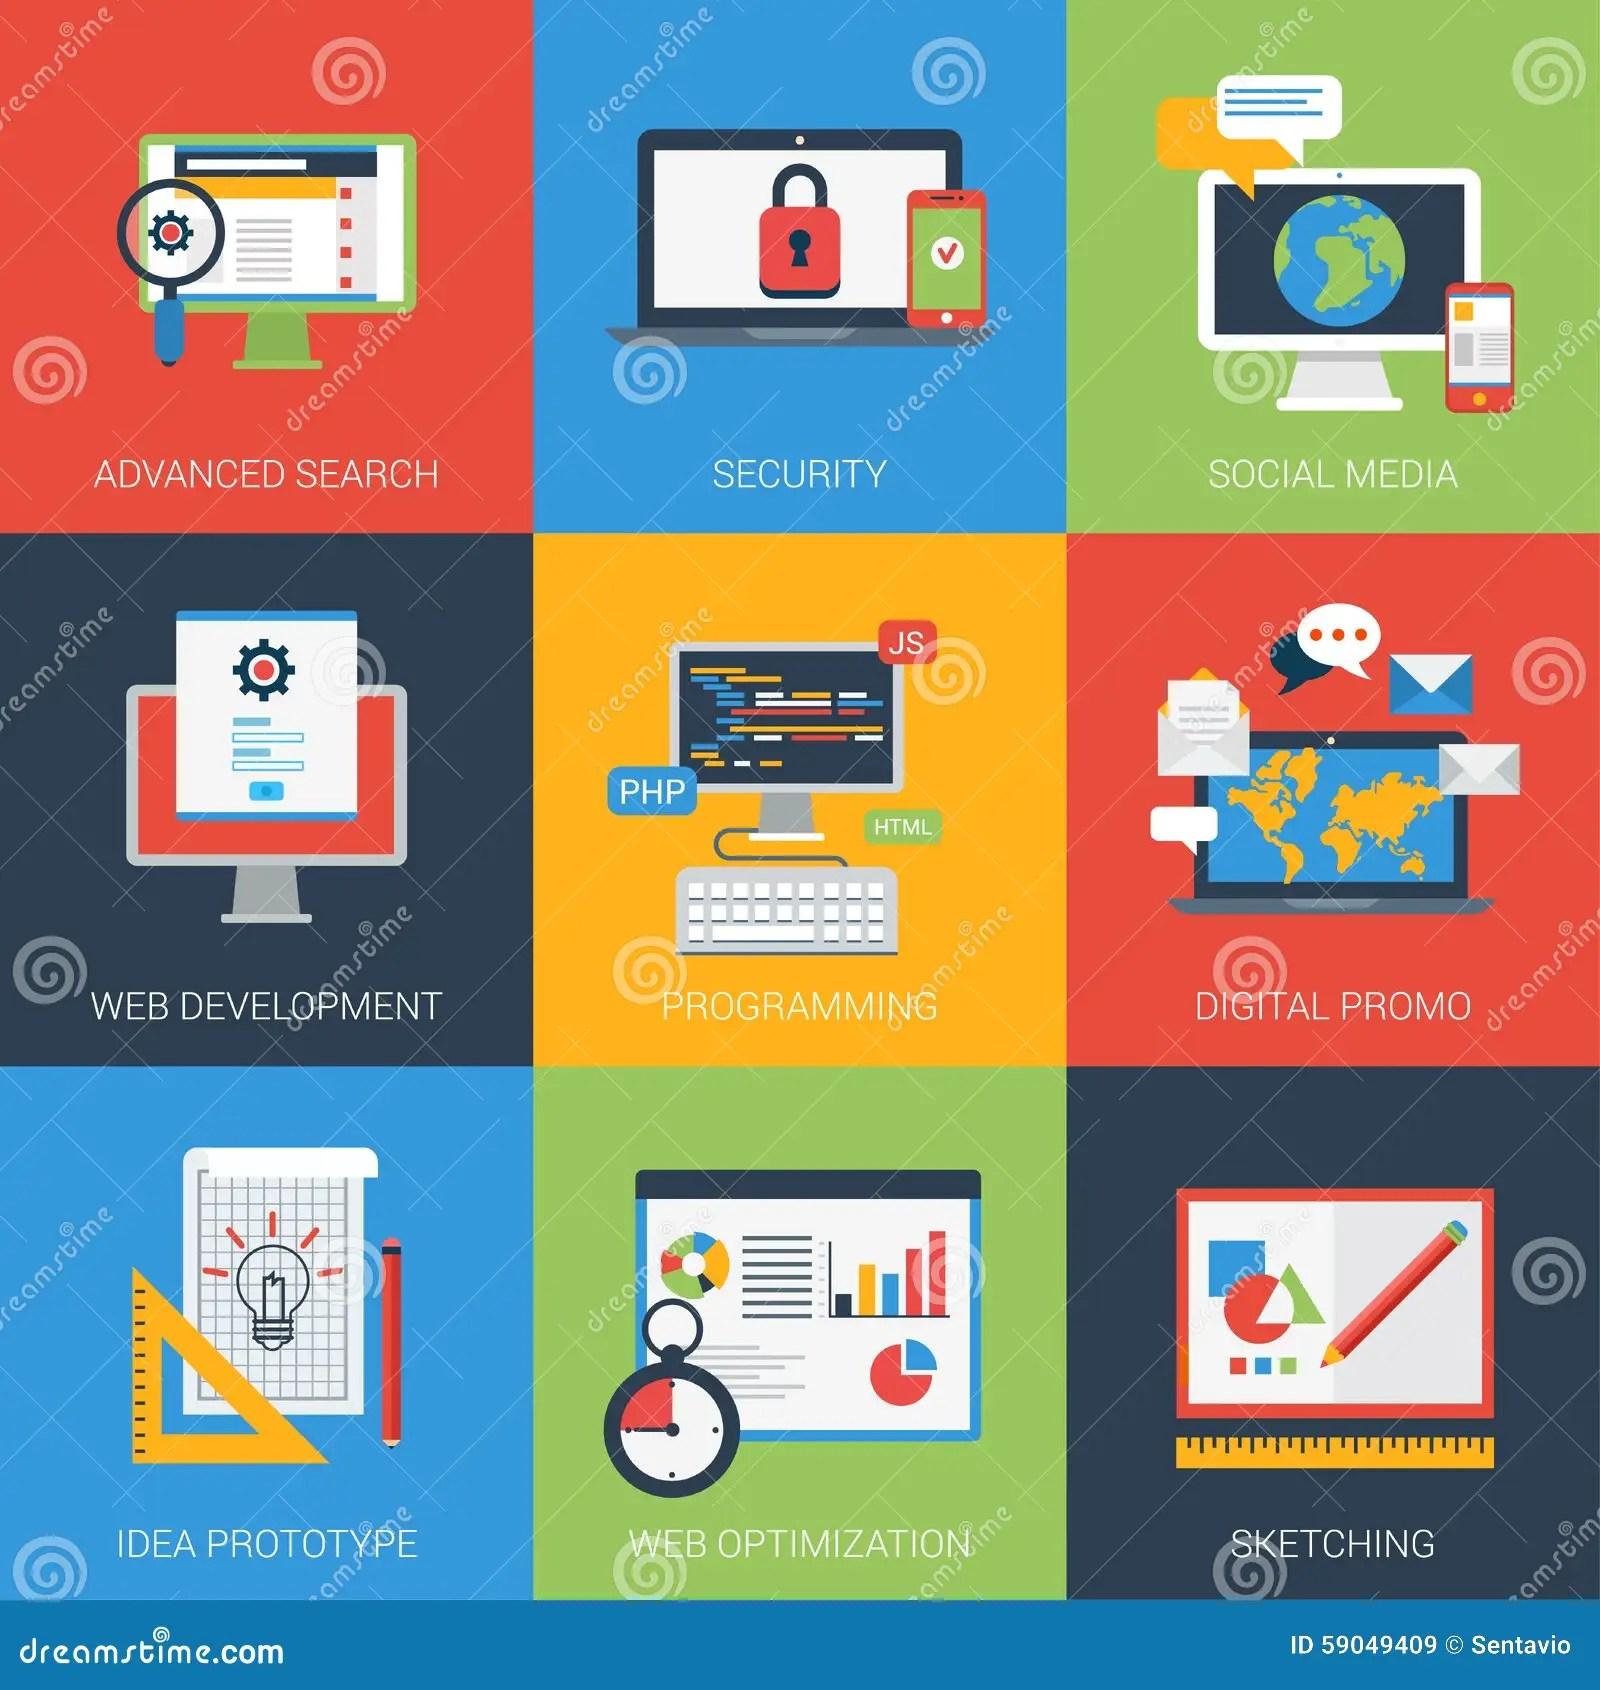 Web Security Developer